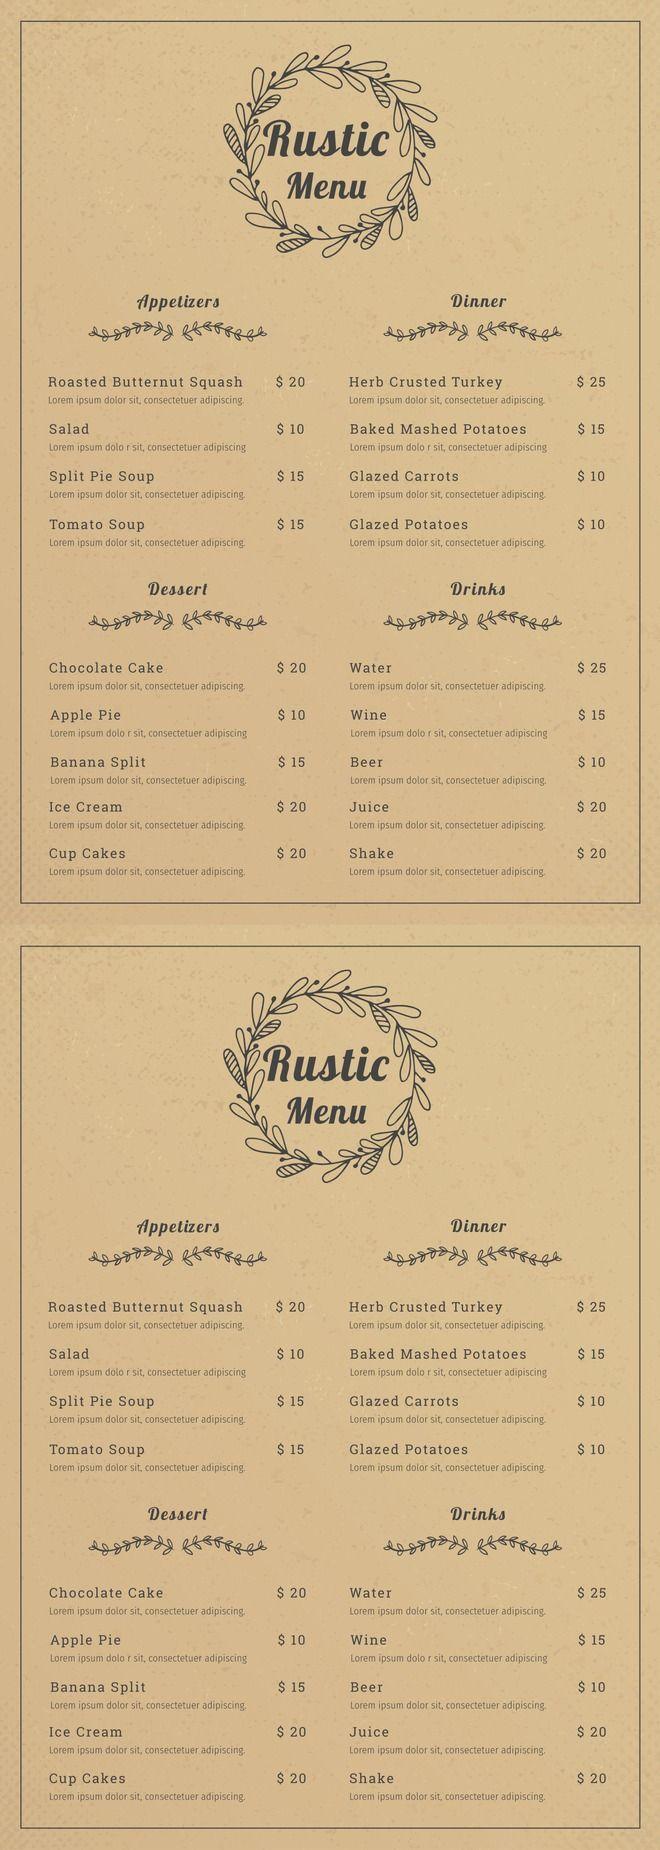 Rustic Menu Template Free Psd Illustrator Word Apple Pages Publisher Template Net Menu Design Template Menu Design Inspiration Menu Template Free editable restaurant menu templates